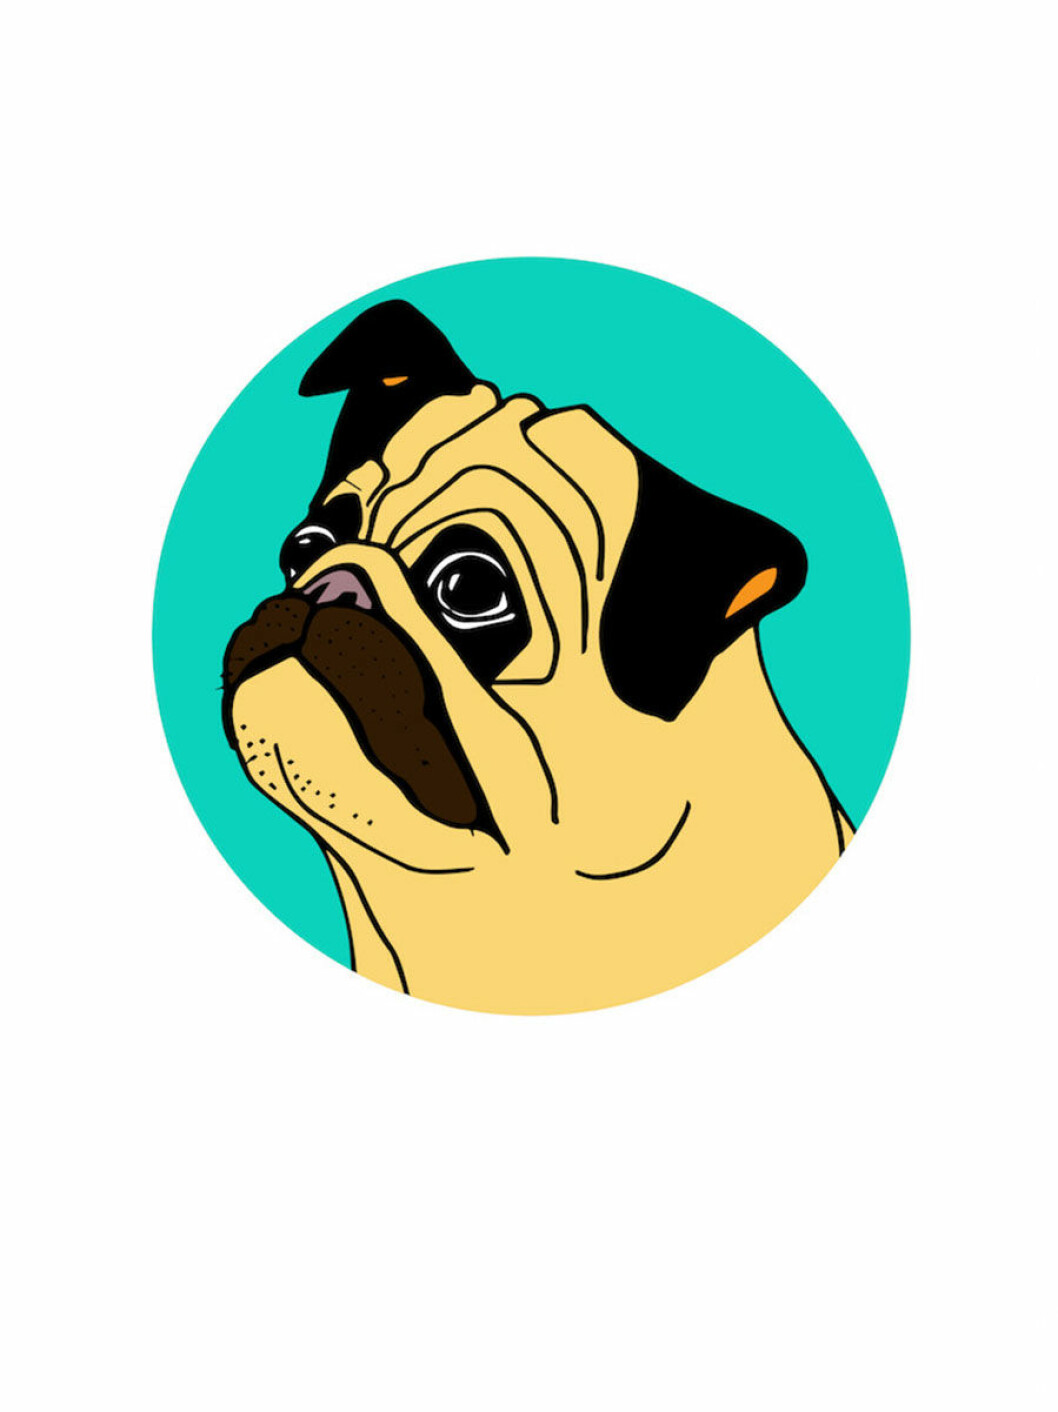 ErikssonpRINT-pug-cirkel